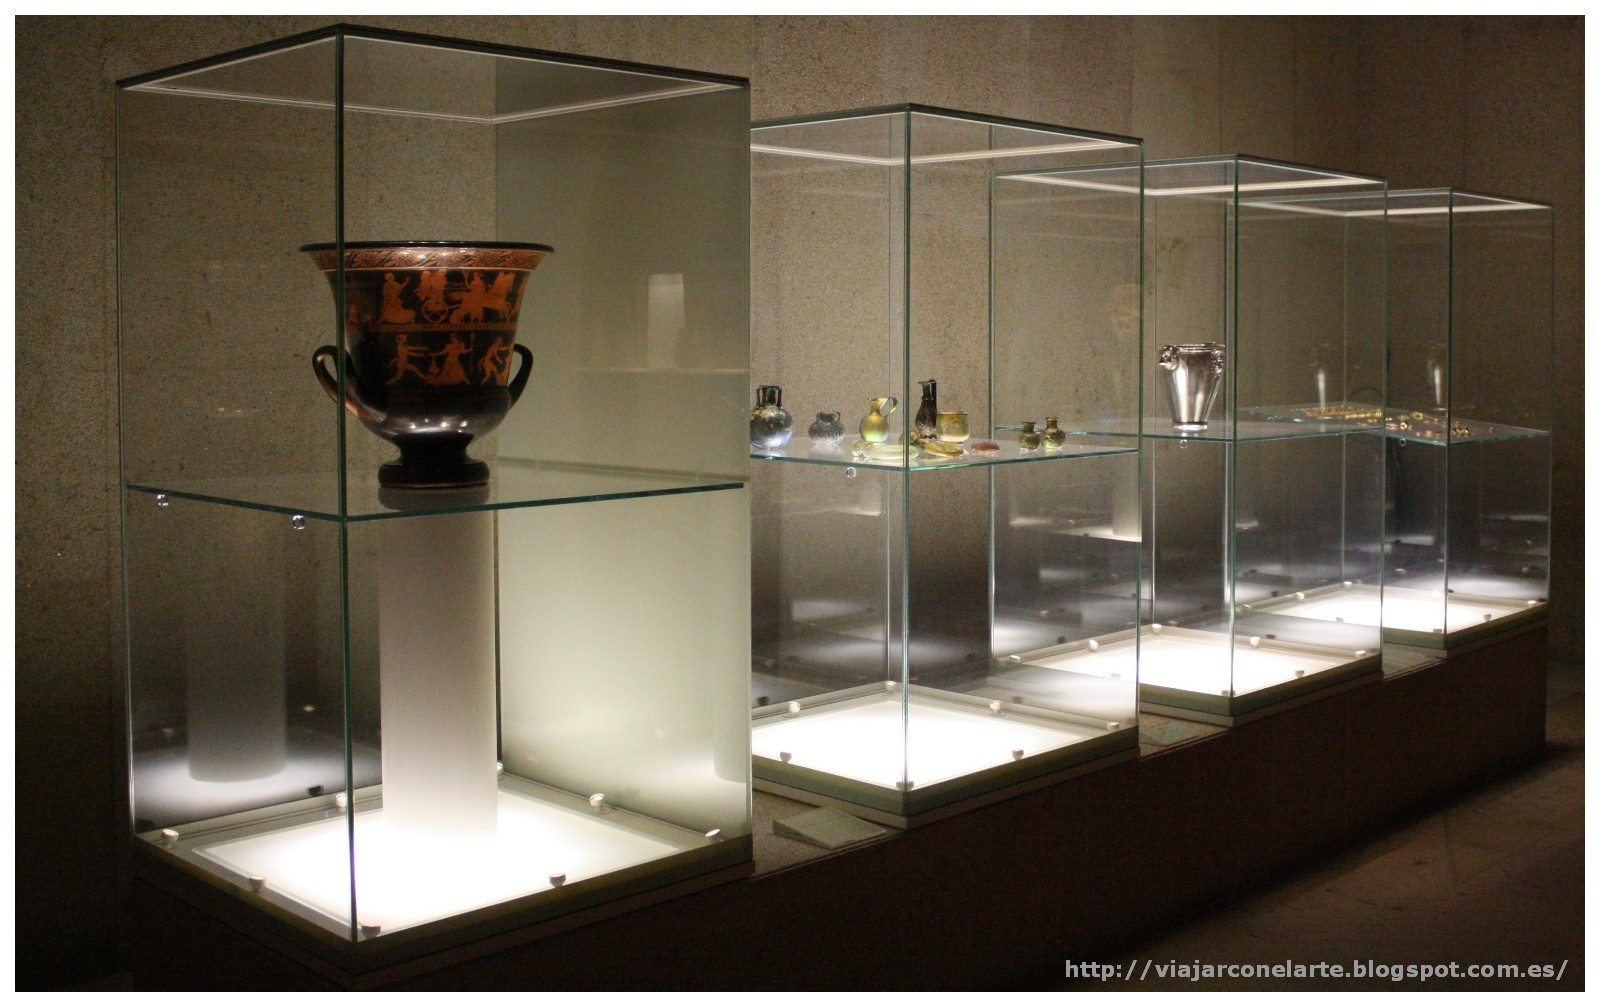 El museu calouste gulbenkian de lisboa - Vitrinas de cristal para colecciones ...